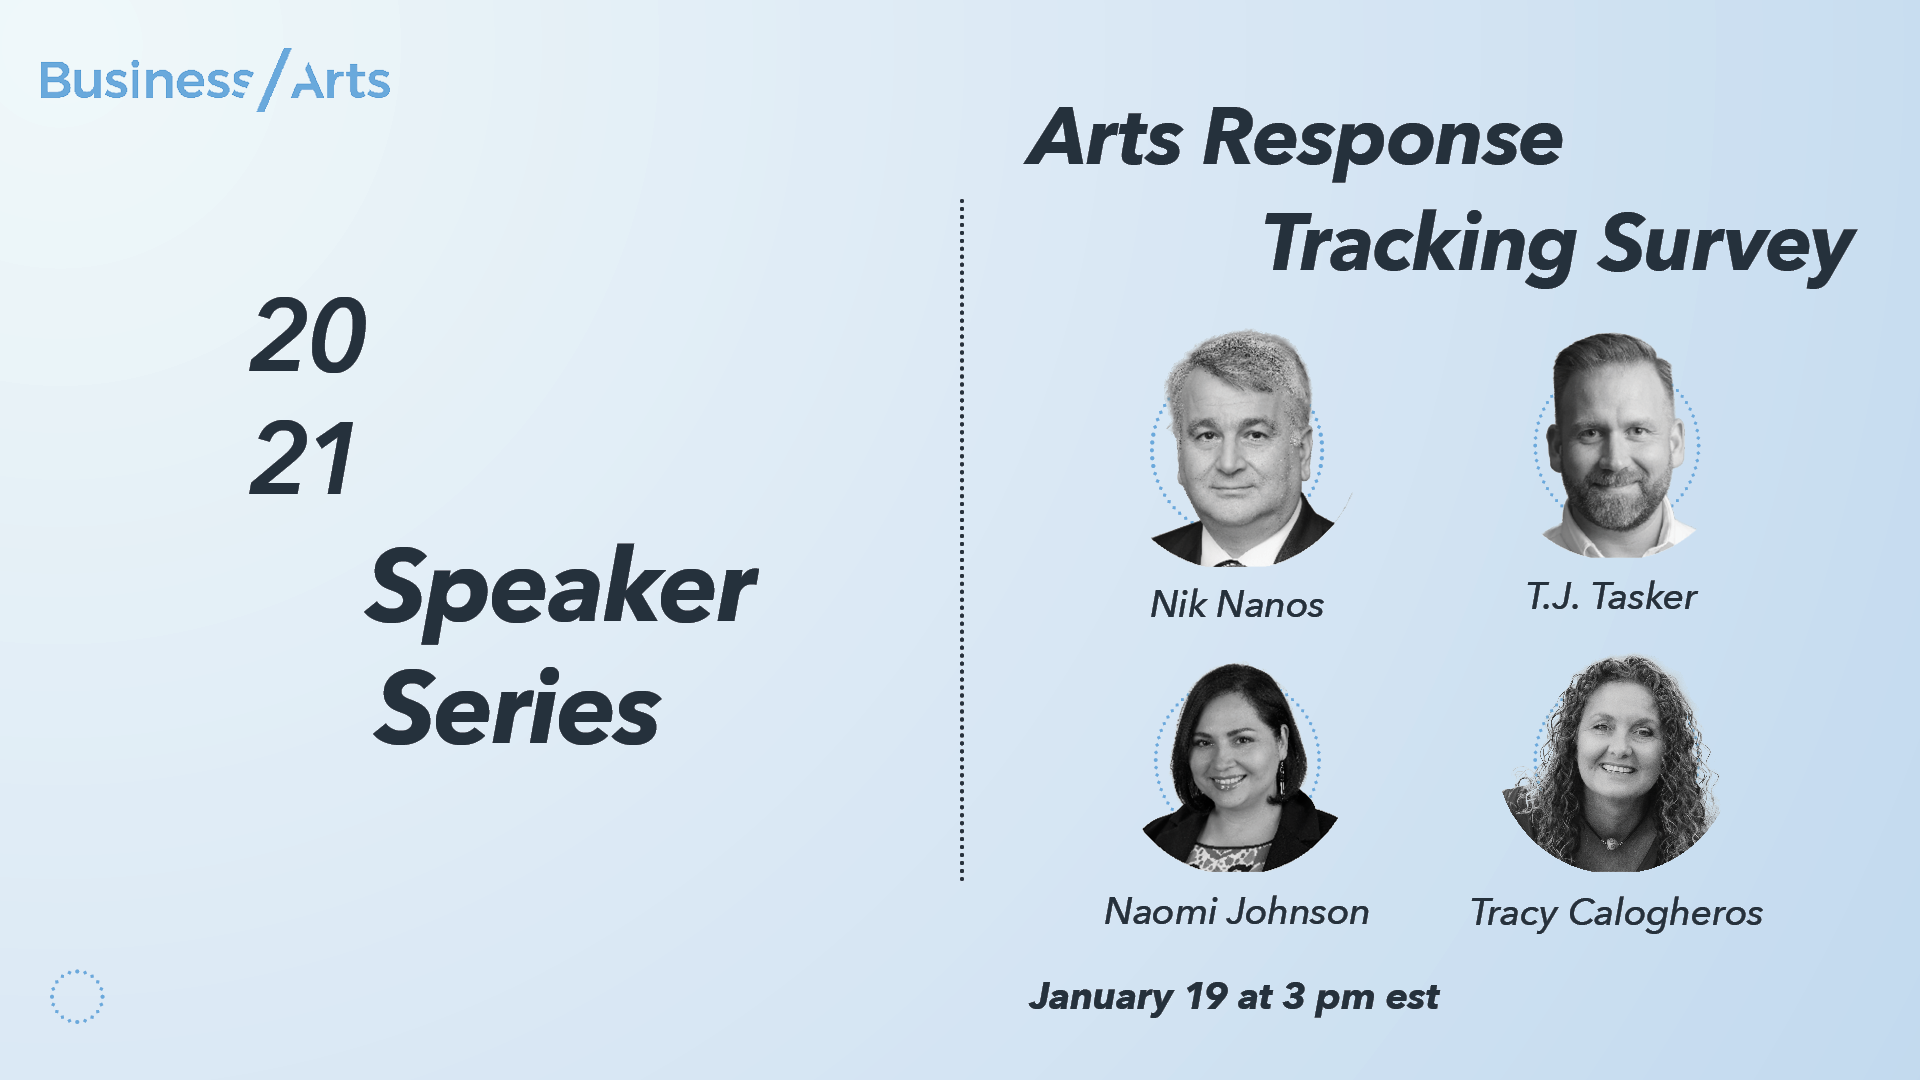 Arts Response Tracking Survey (January 2021)